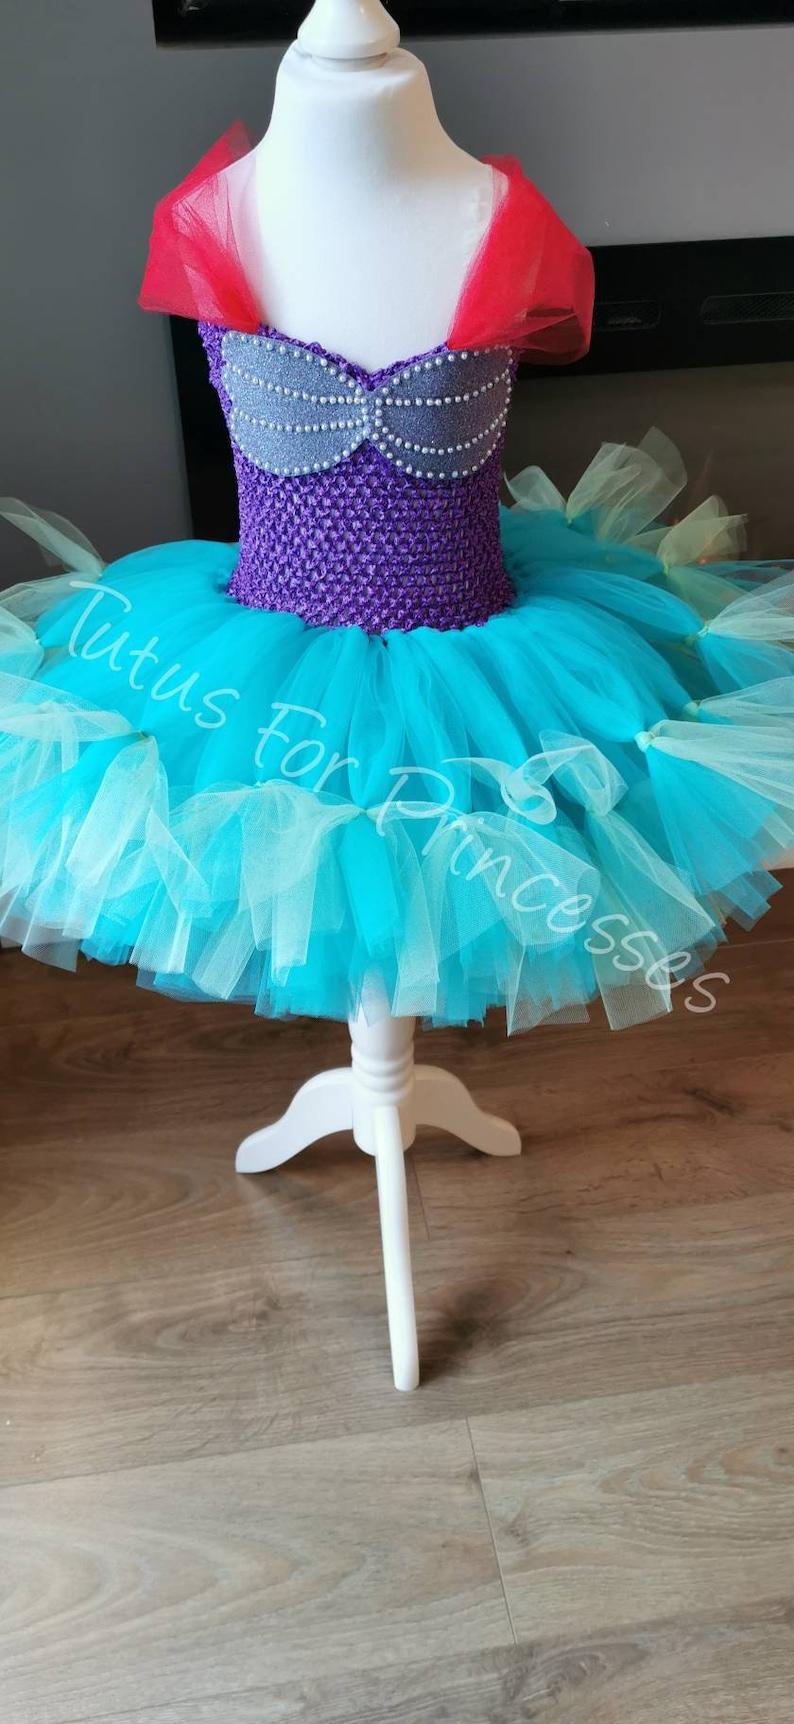 Photoshoot Custom Made Birthday Ariel Little Mermaid Inspired Tutu Dress